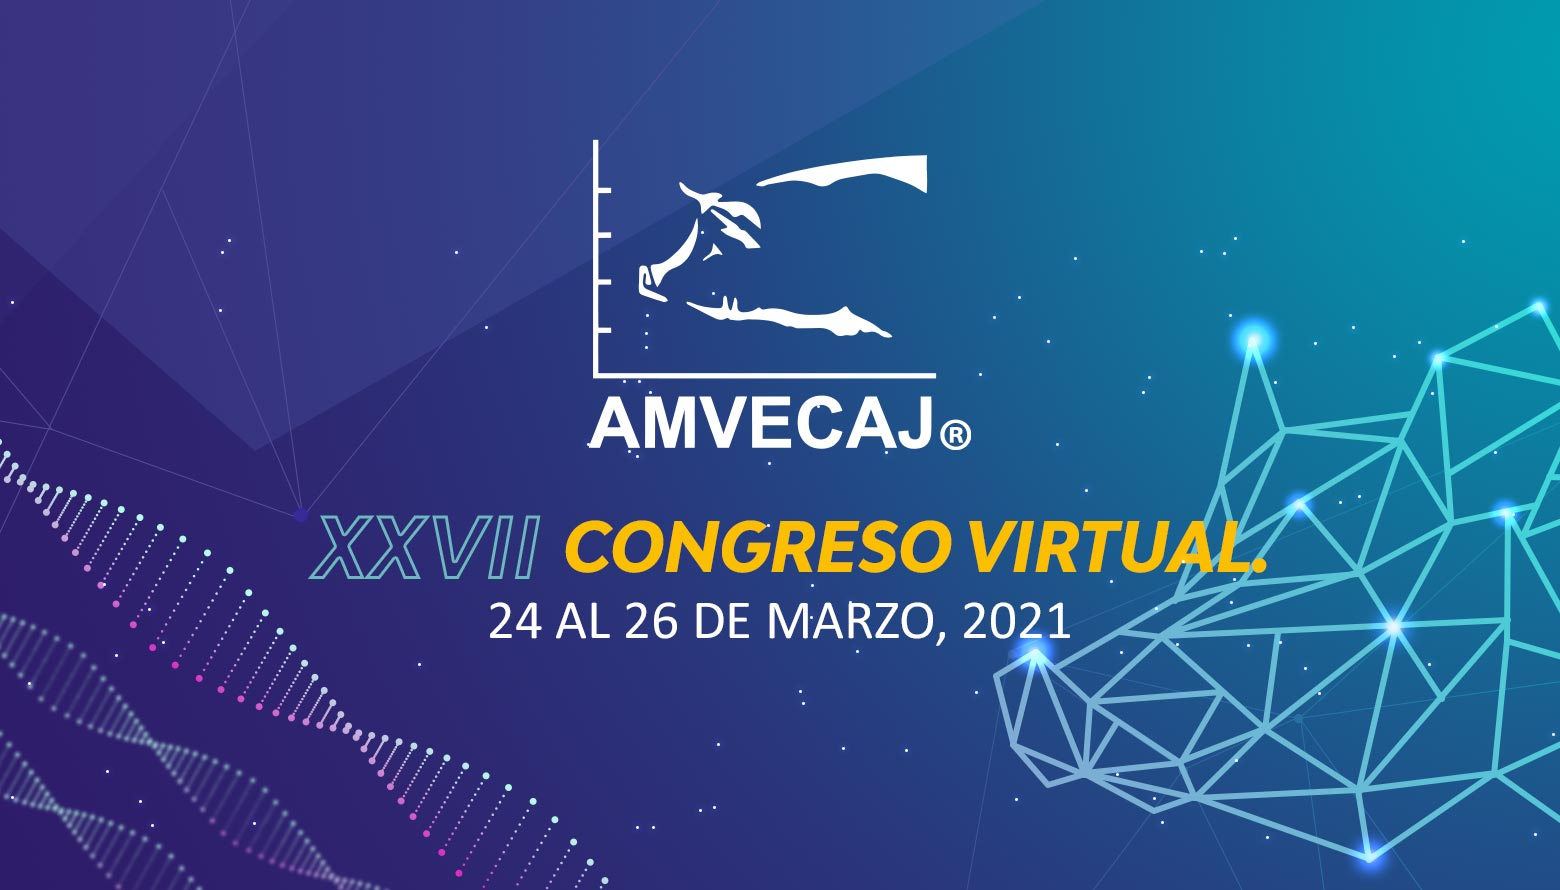 XXVII Congreso AMVECAJ 2021